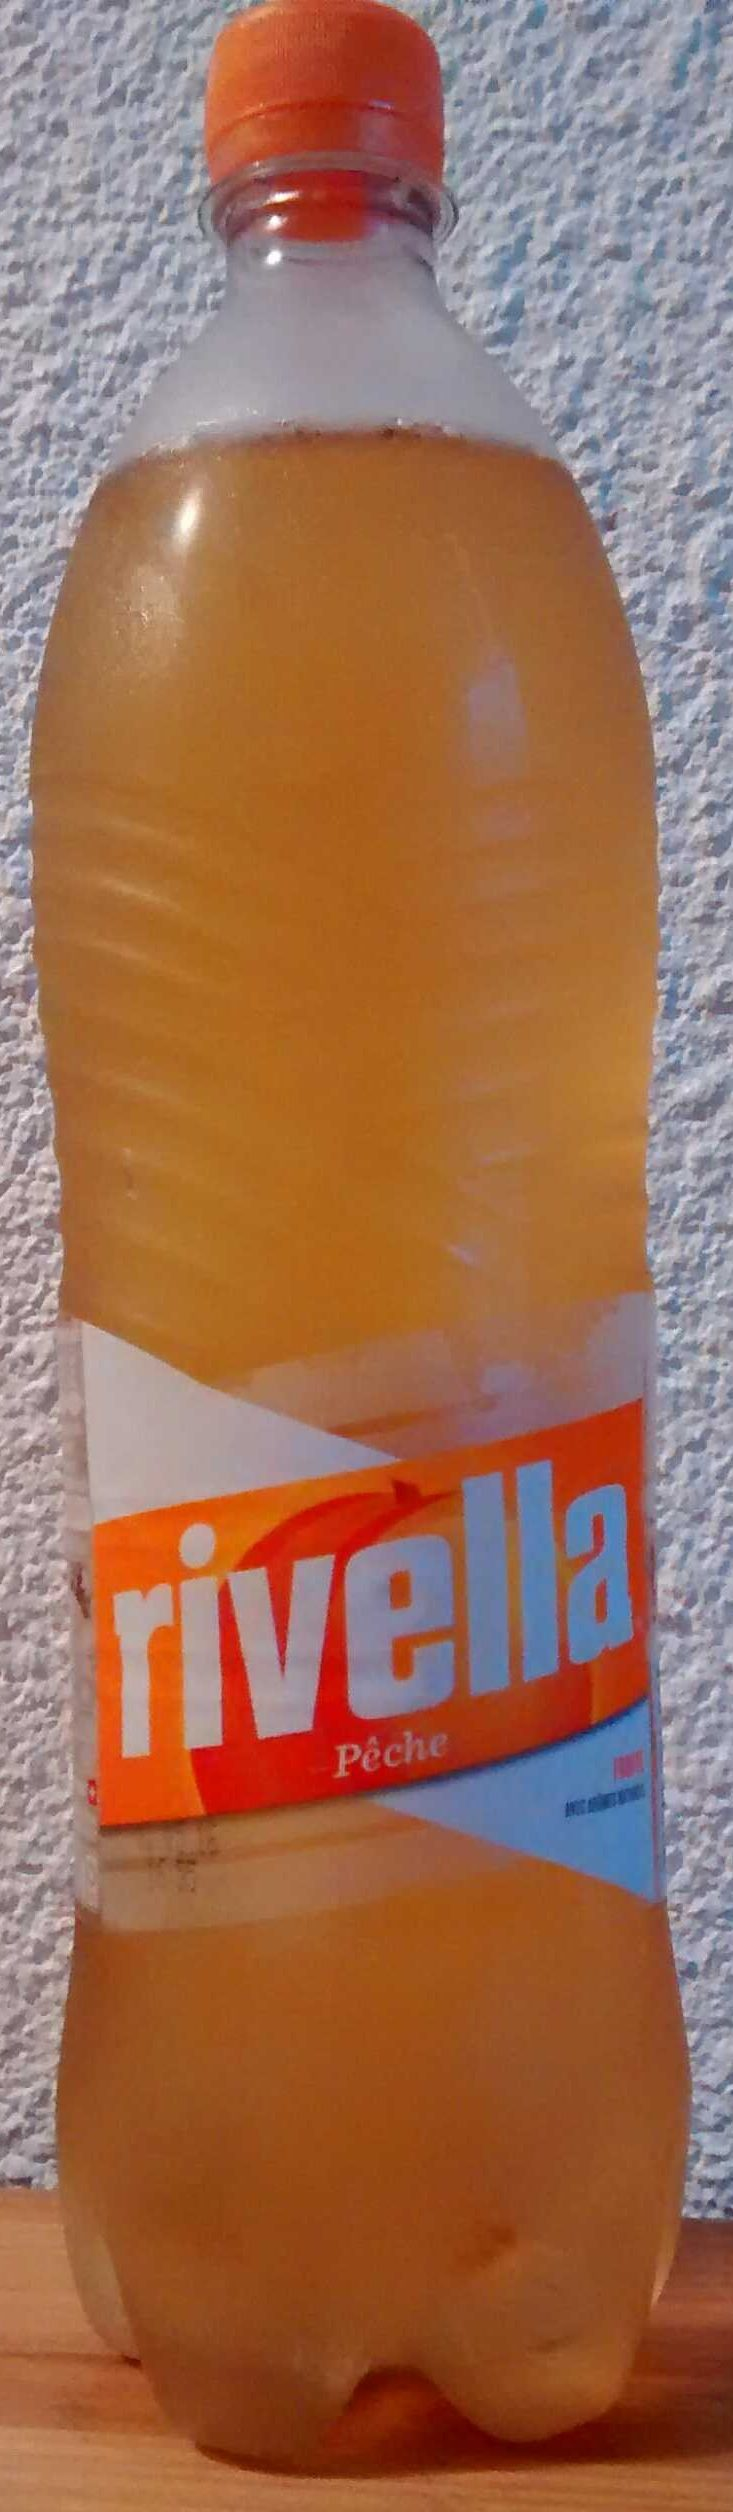 Rivella pêche - Product - fr